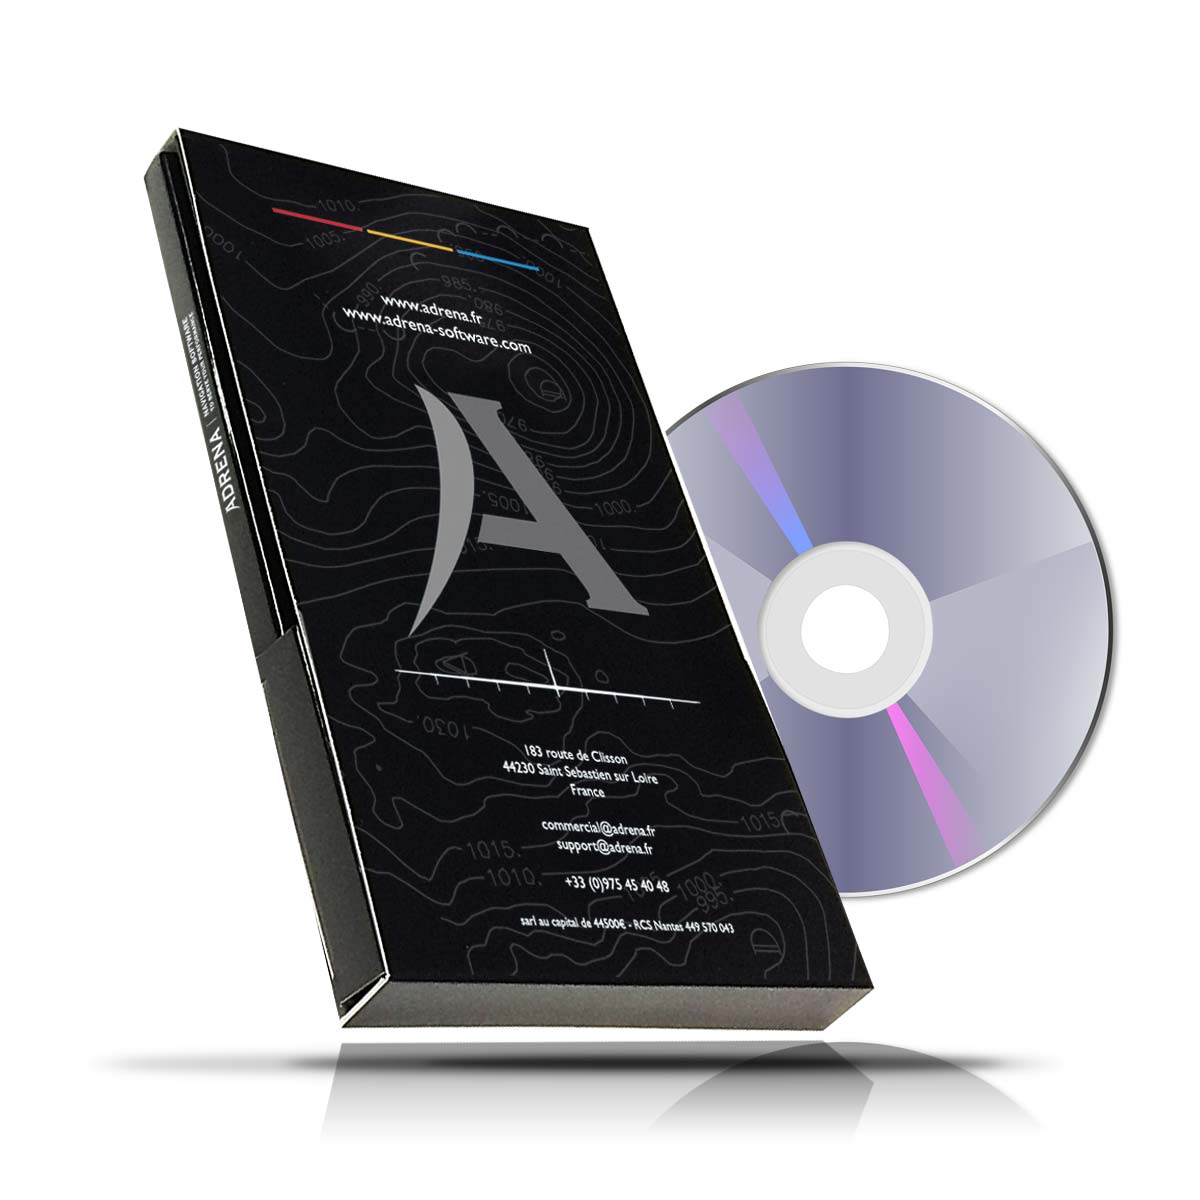 Pack AdrenaFirst Offshore | Adrena Software